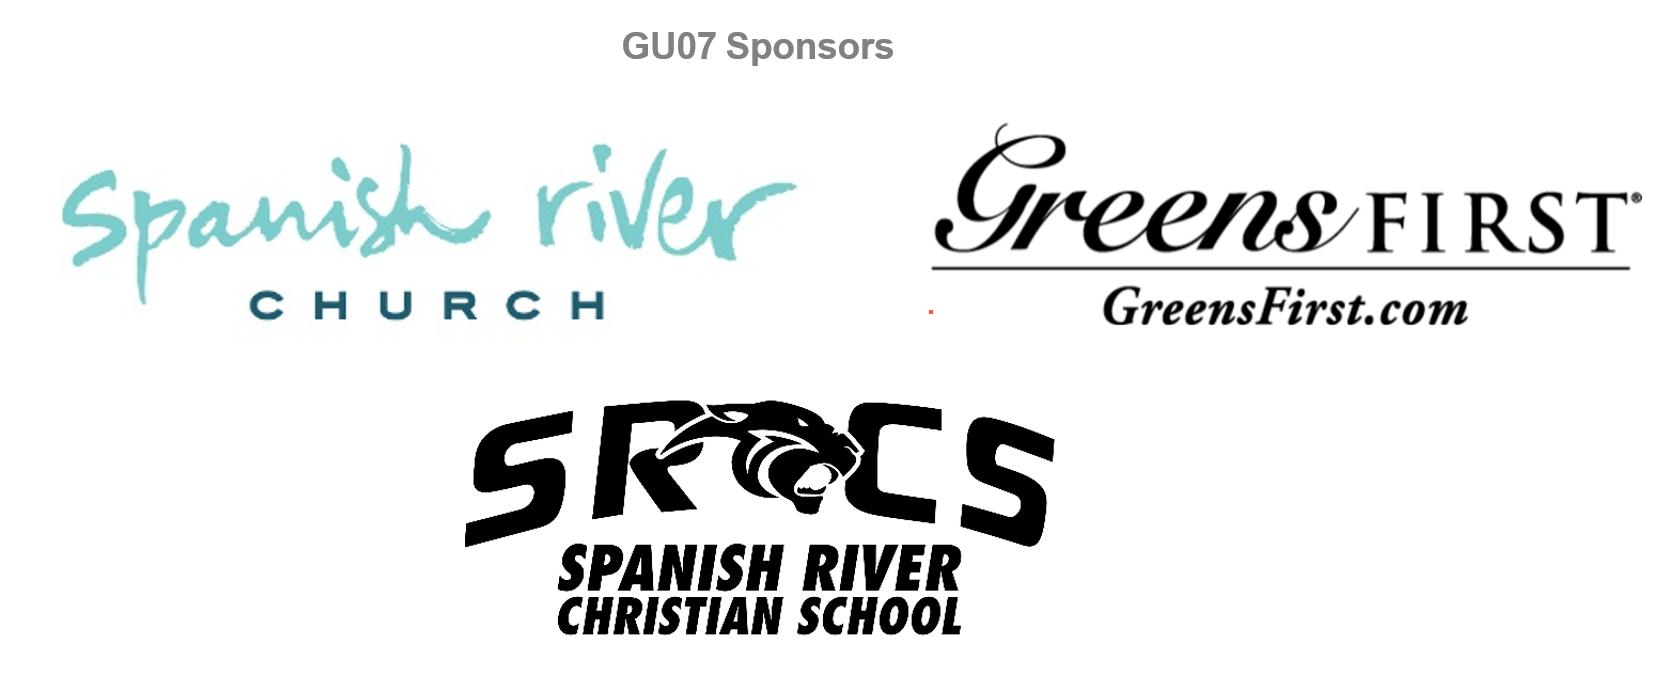 GU07_Sponsors2020